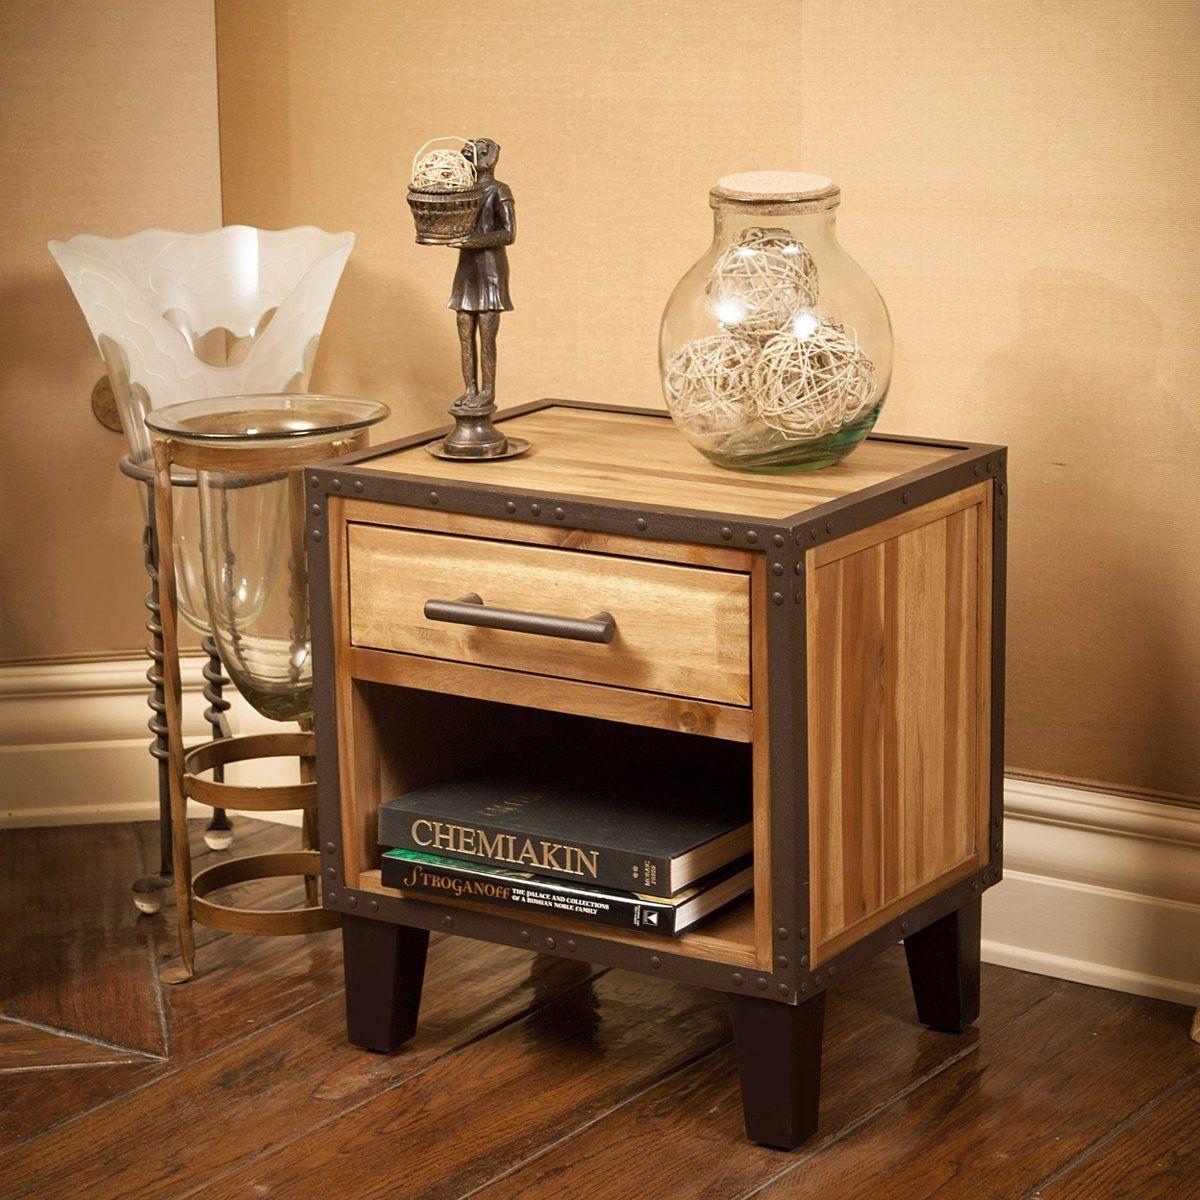 Glendora industrial solid wood single drawer end table